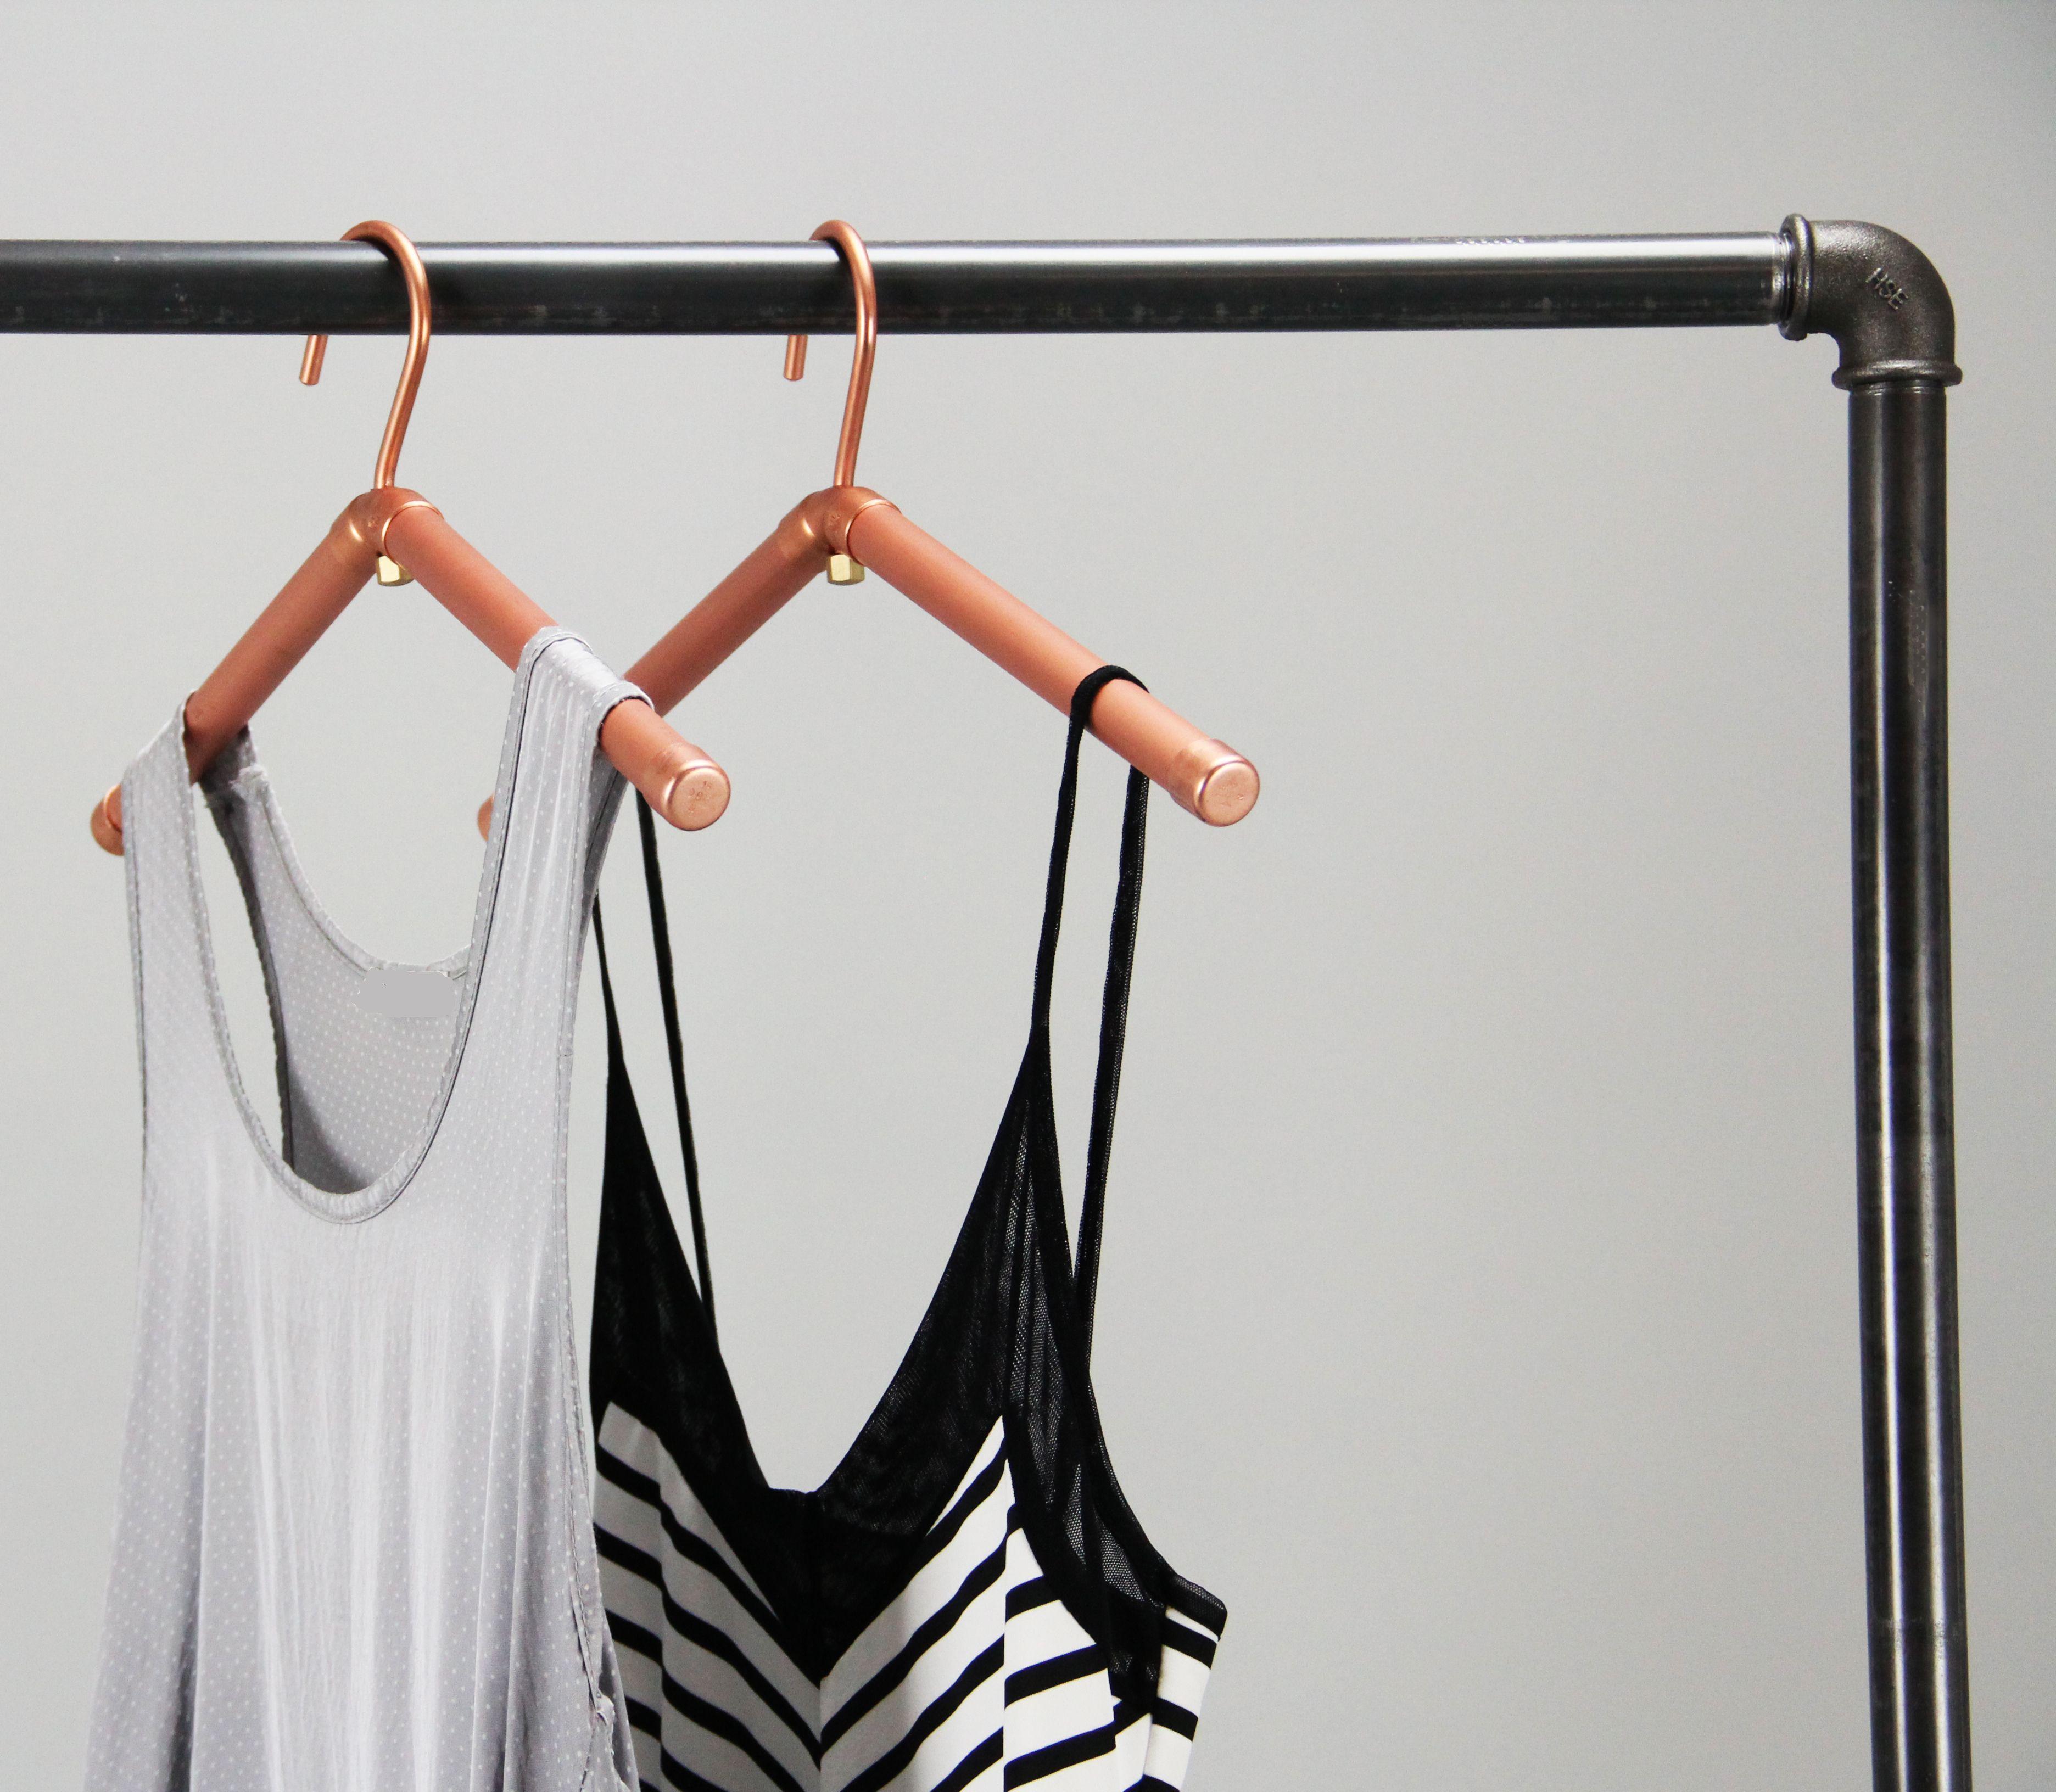 Elegante Kleiderstander Aus Stahl Robuste Mobelelemente Die Mit